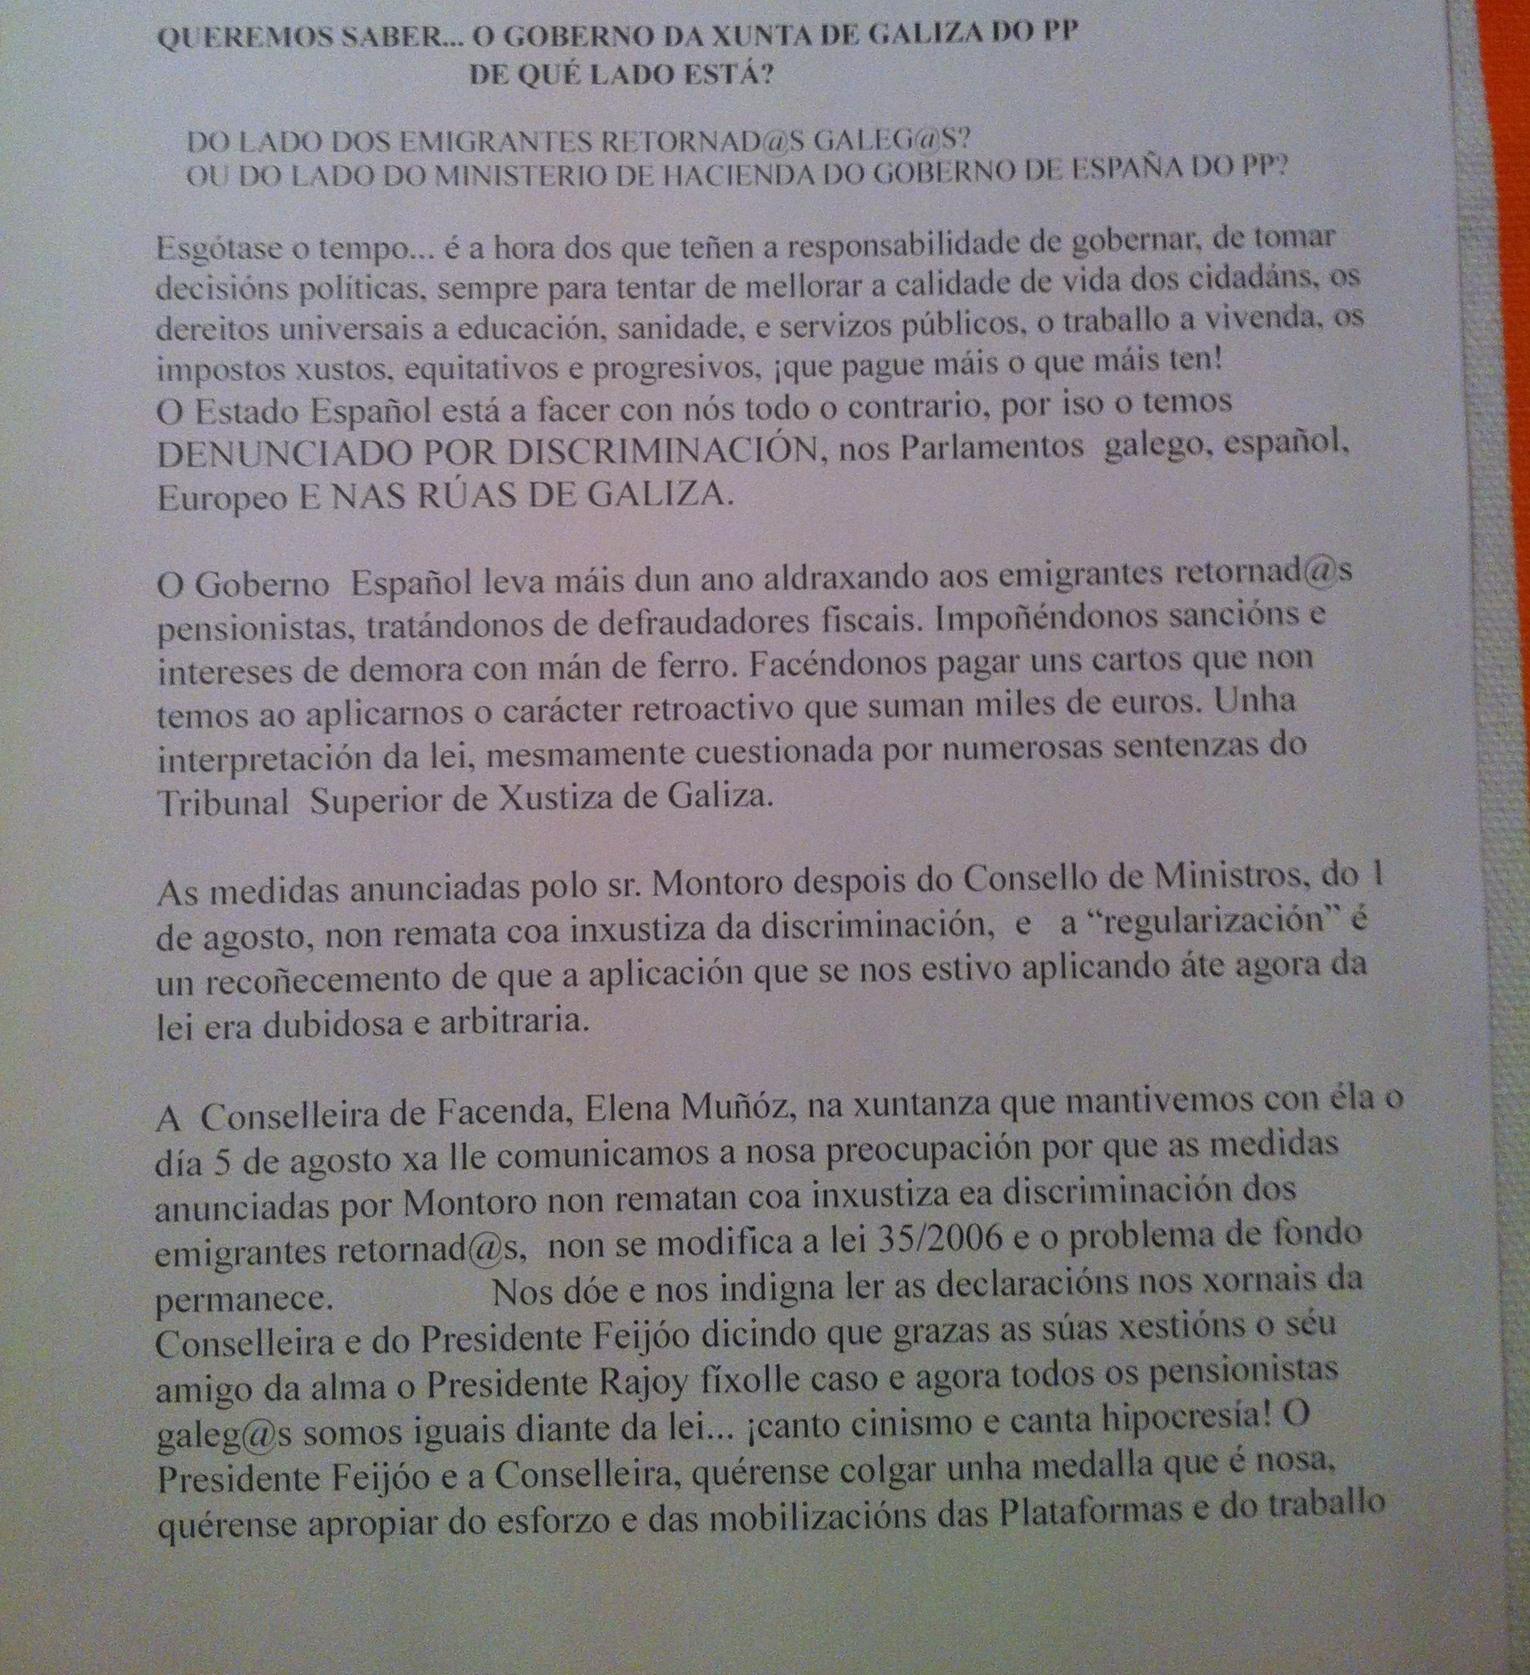 Manifesto 1/2 Colectivo emigrantes retornados